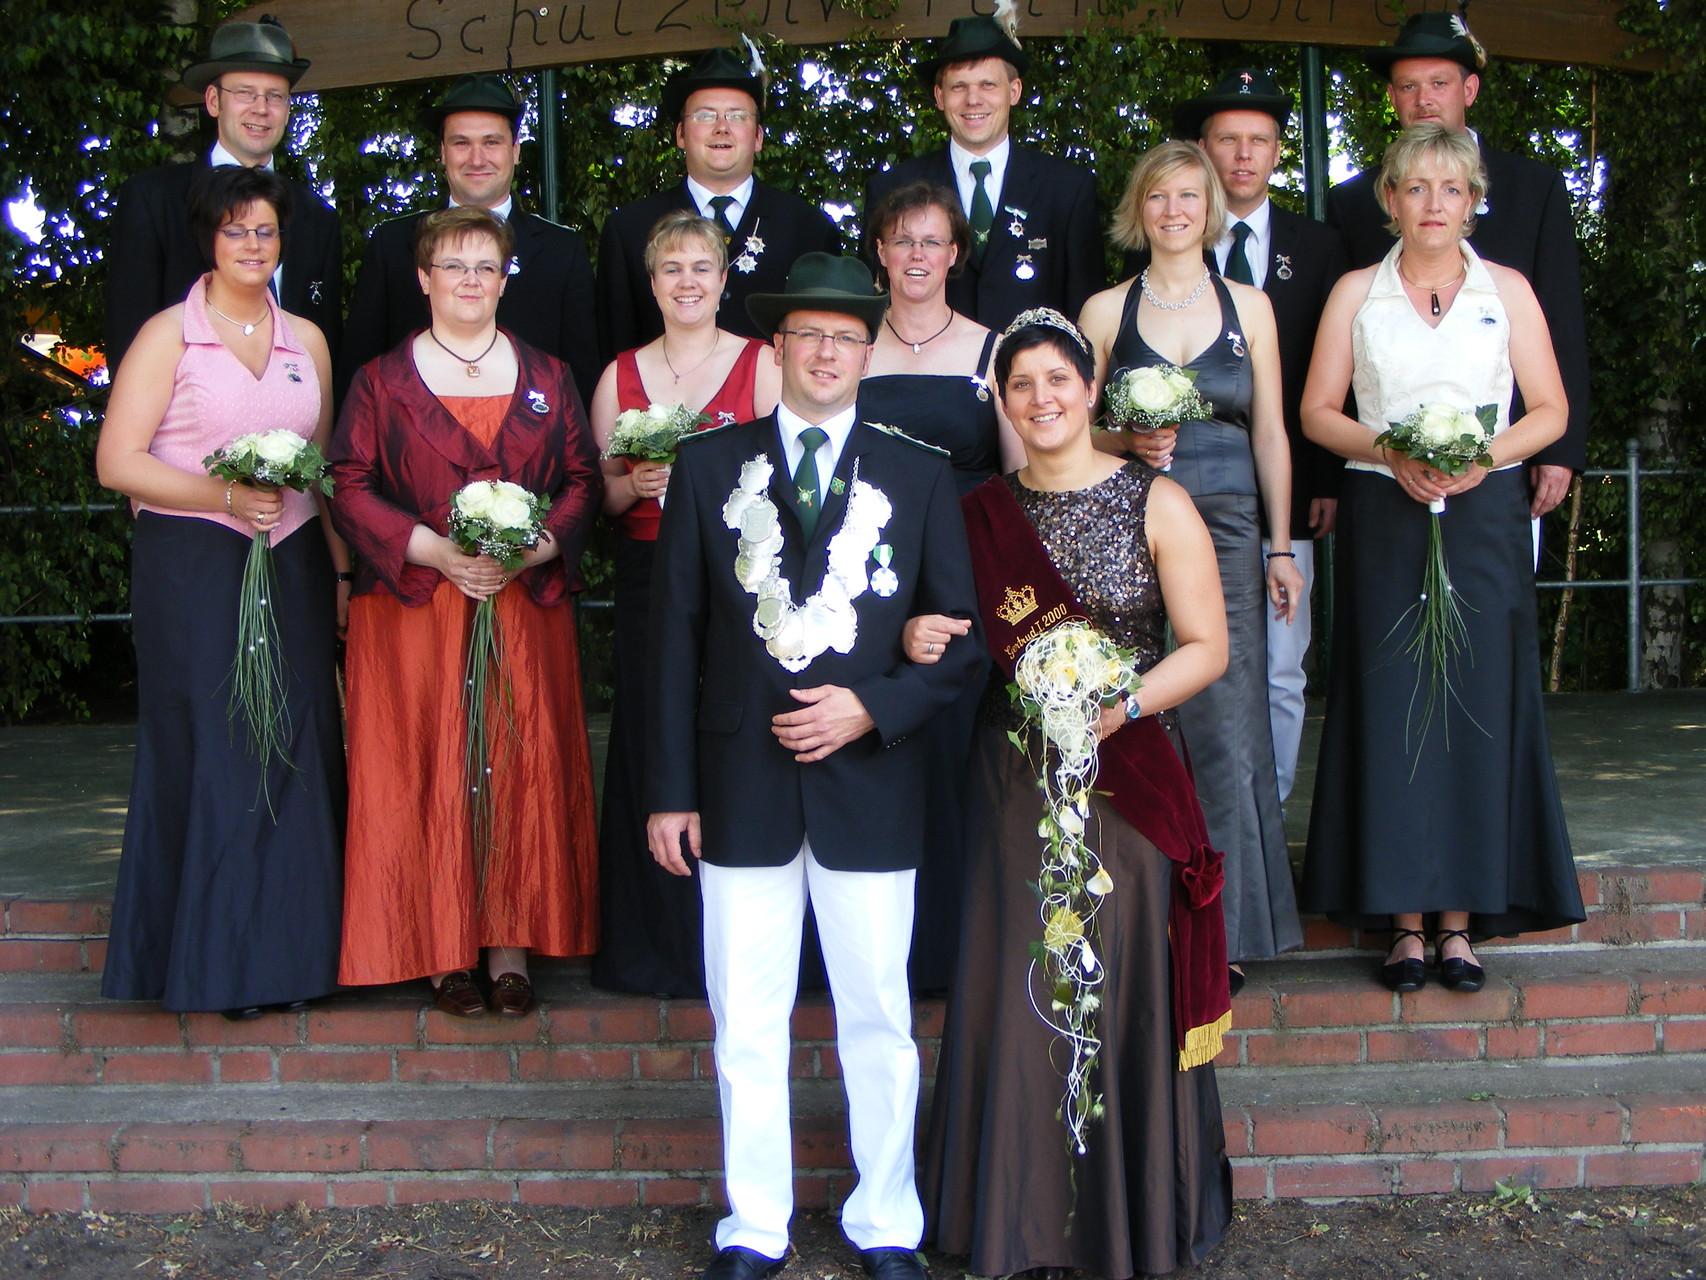 2007: König Andreas Große Hartmann und Königin Silvia Kiese